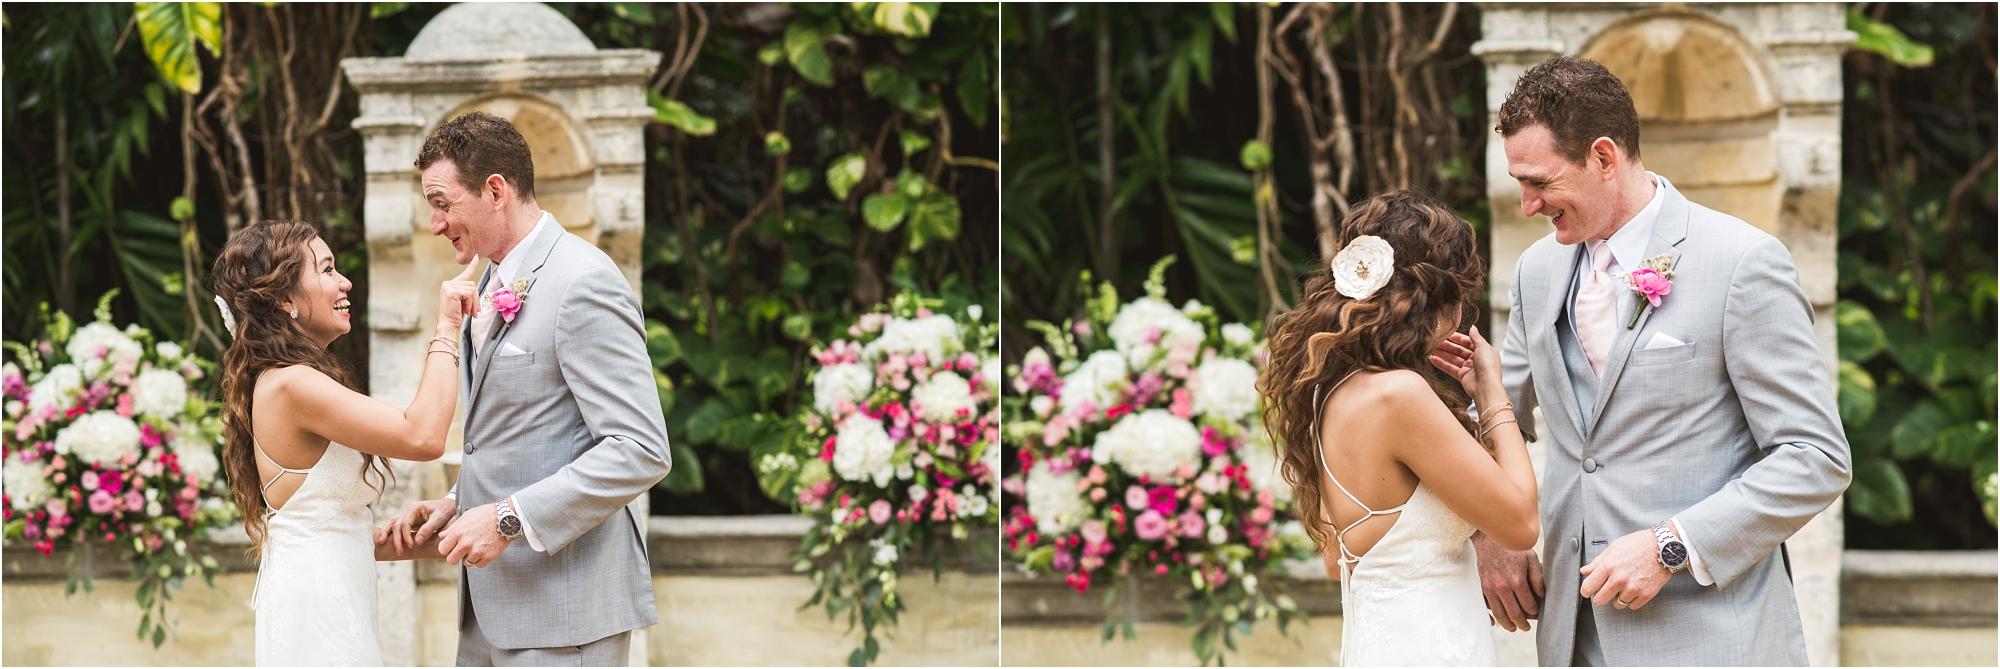 Spanish-Monastery-miami-beach-outdoor-elegant-wedding-photographer-jessenia-gonzalez_1175.jpg